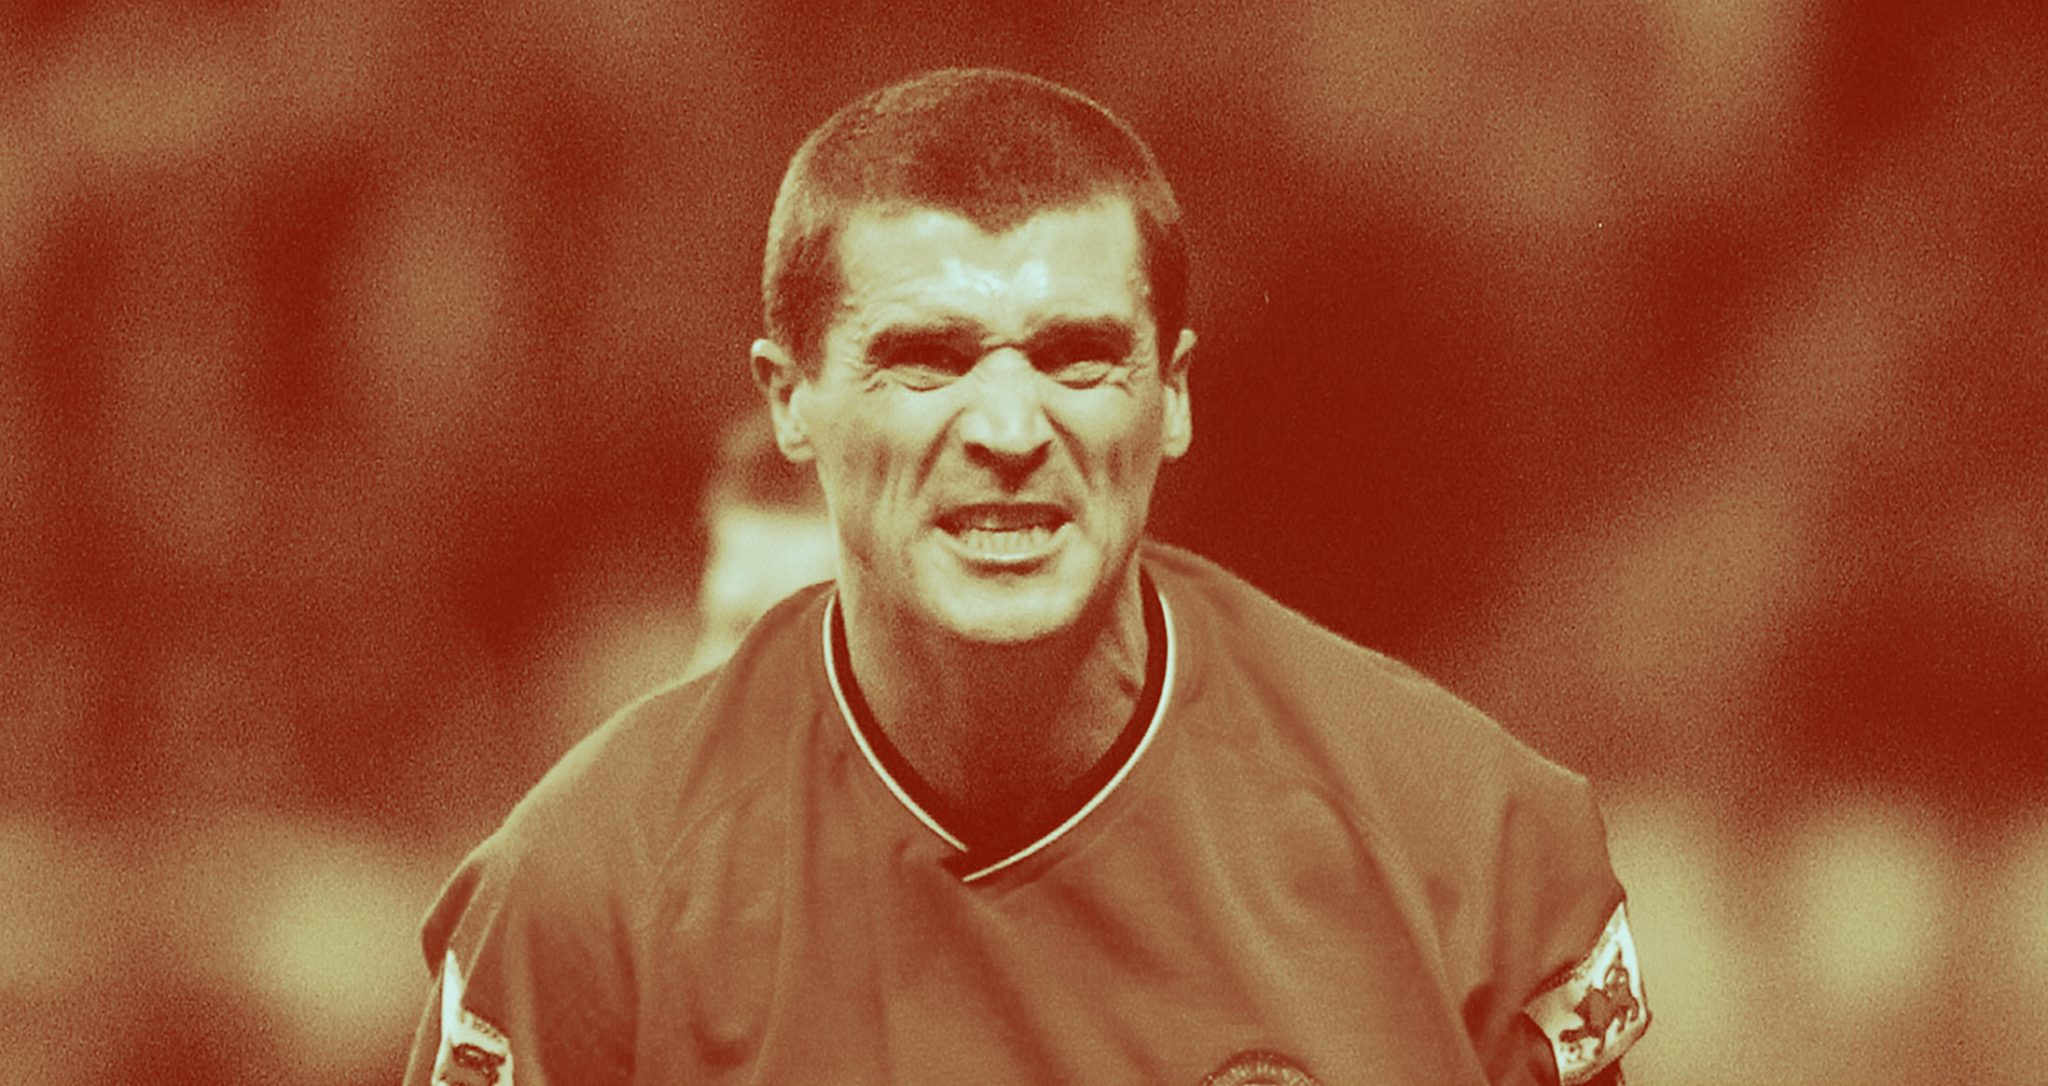 Daftar Kritikan Pedas Roy Keane Terhadap Manchester United